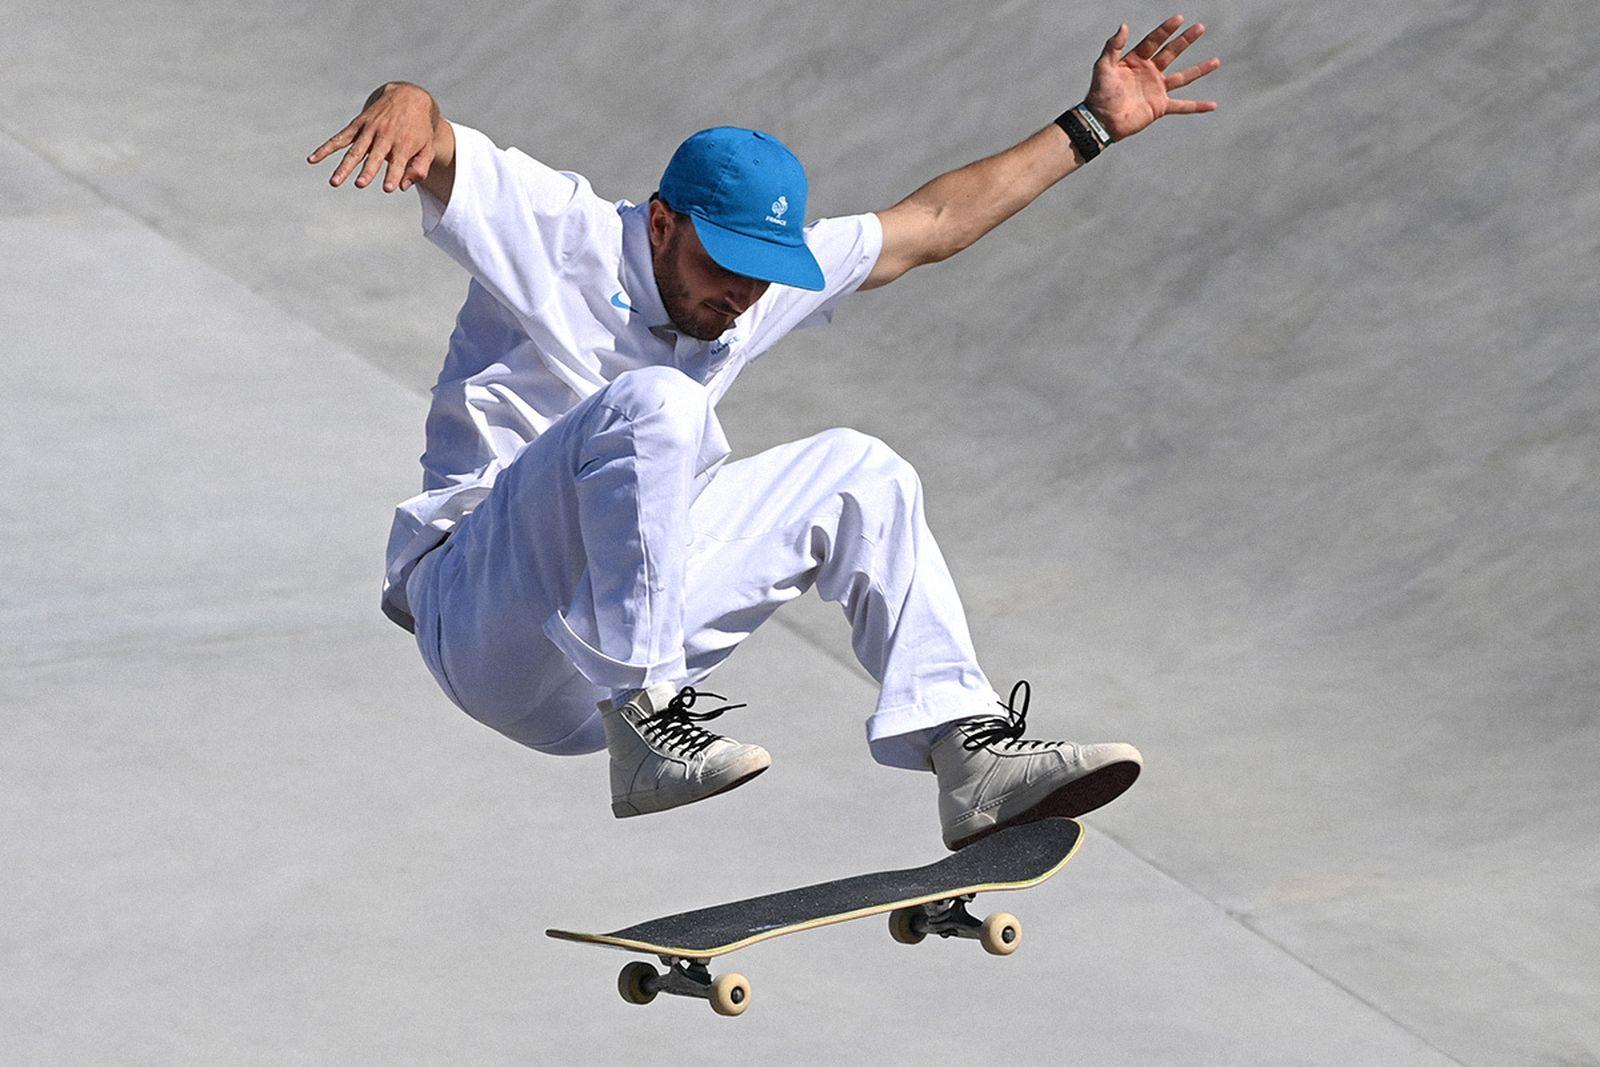 skate-style-tokyo-olympics-01